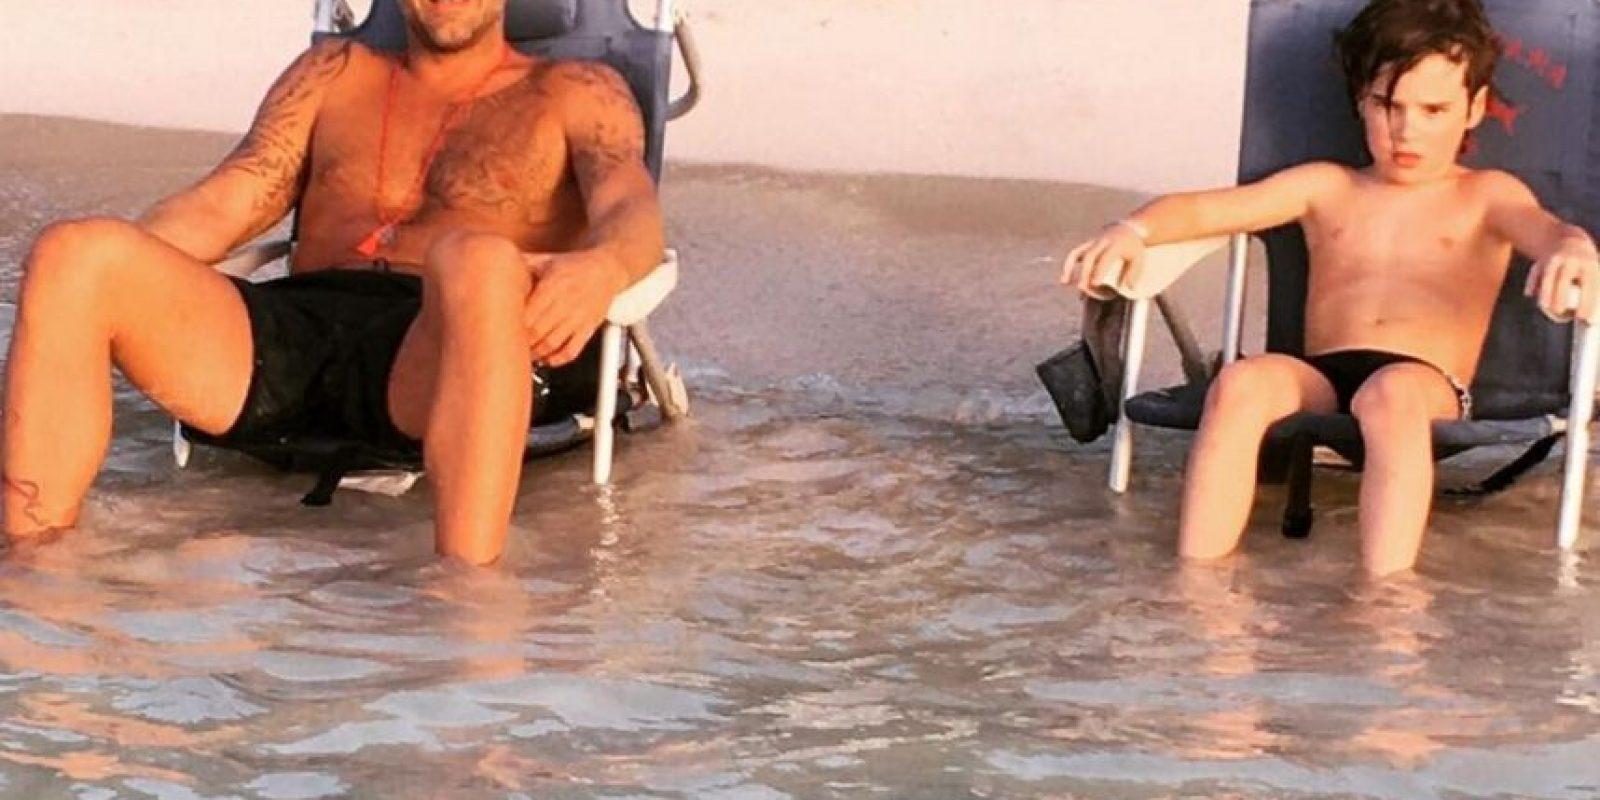 Padre e hijo en la playa Foto:Instagram/@rickymartin